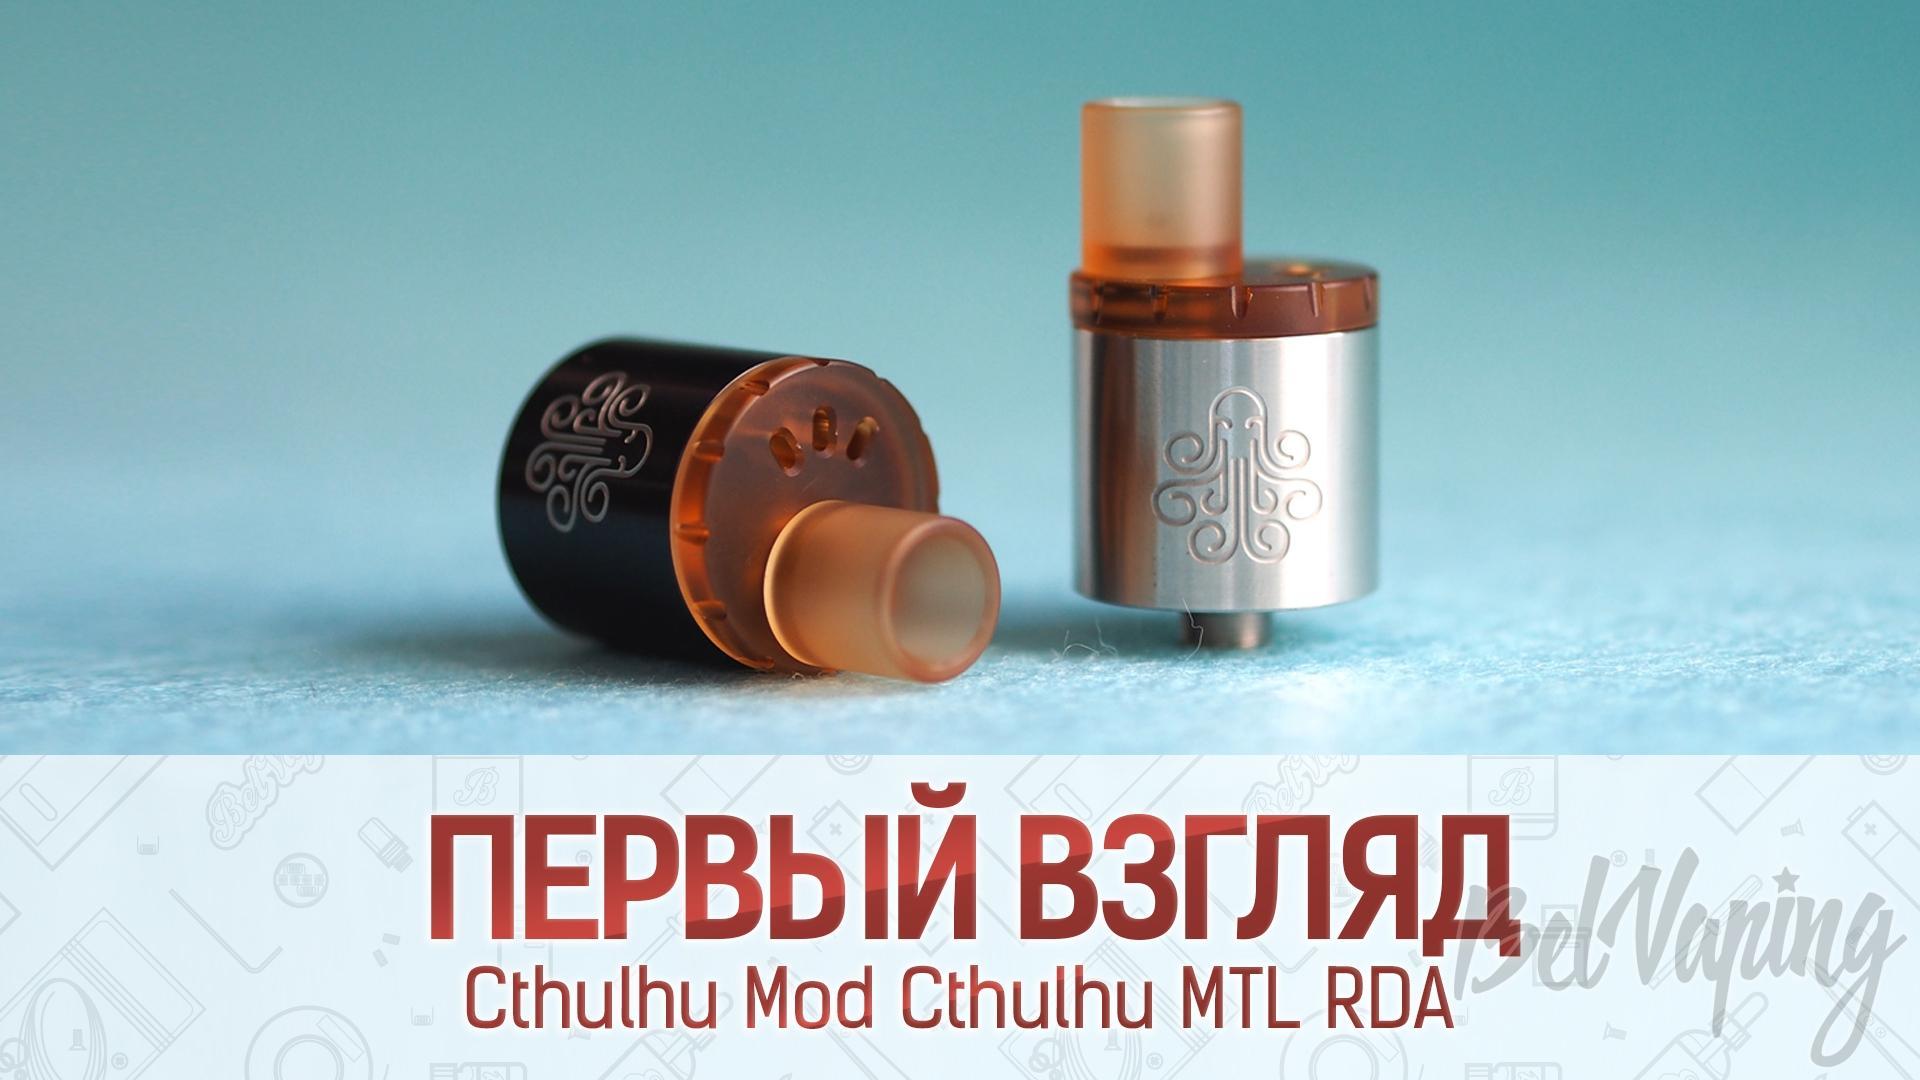 Cthulhu Mod Cthulhu MTL RDA. Первый взгляд